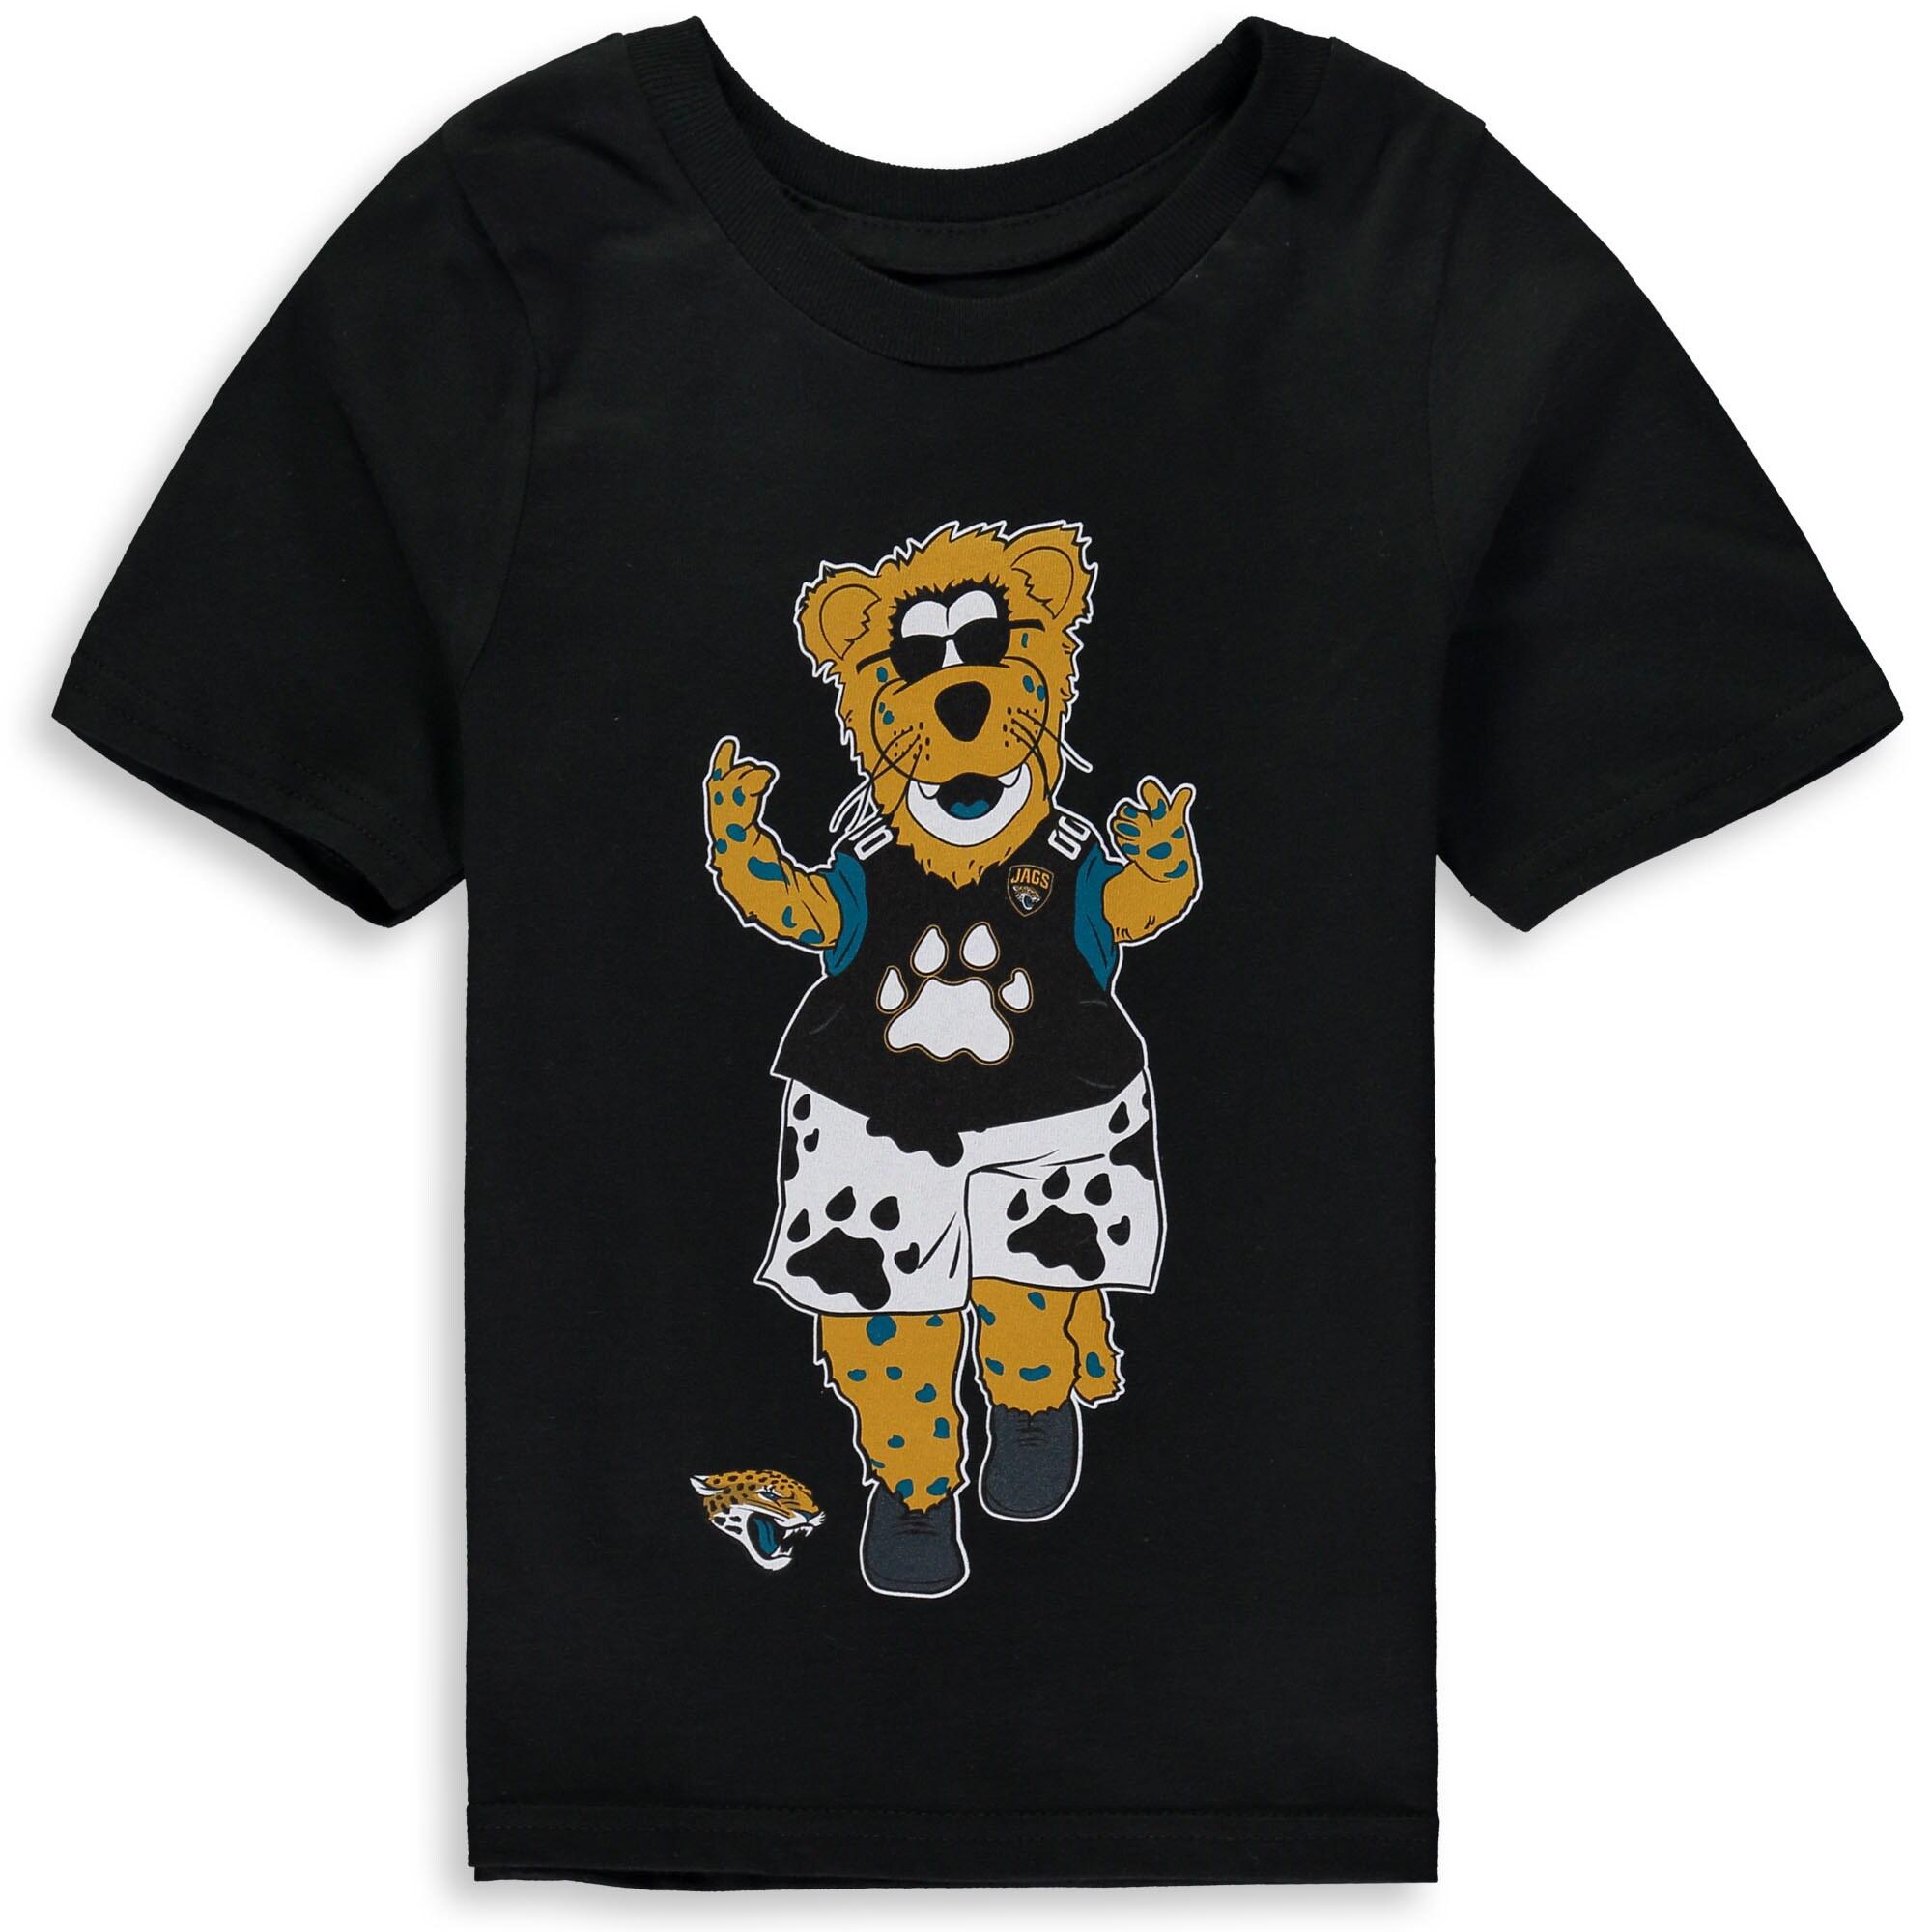 Jacksonville Jaguars Preschool Standing Mascot T-Shirt - Black